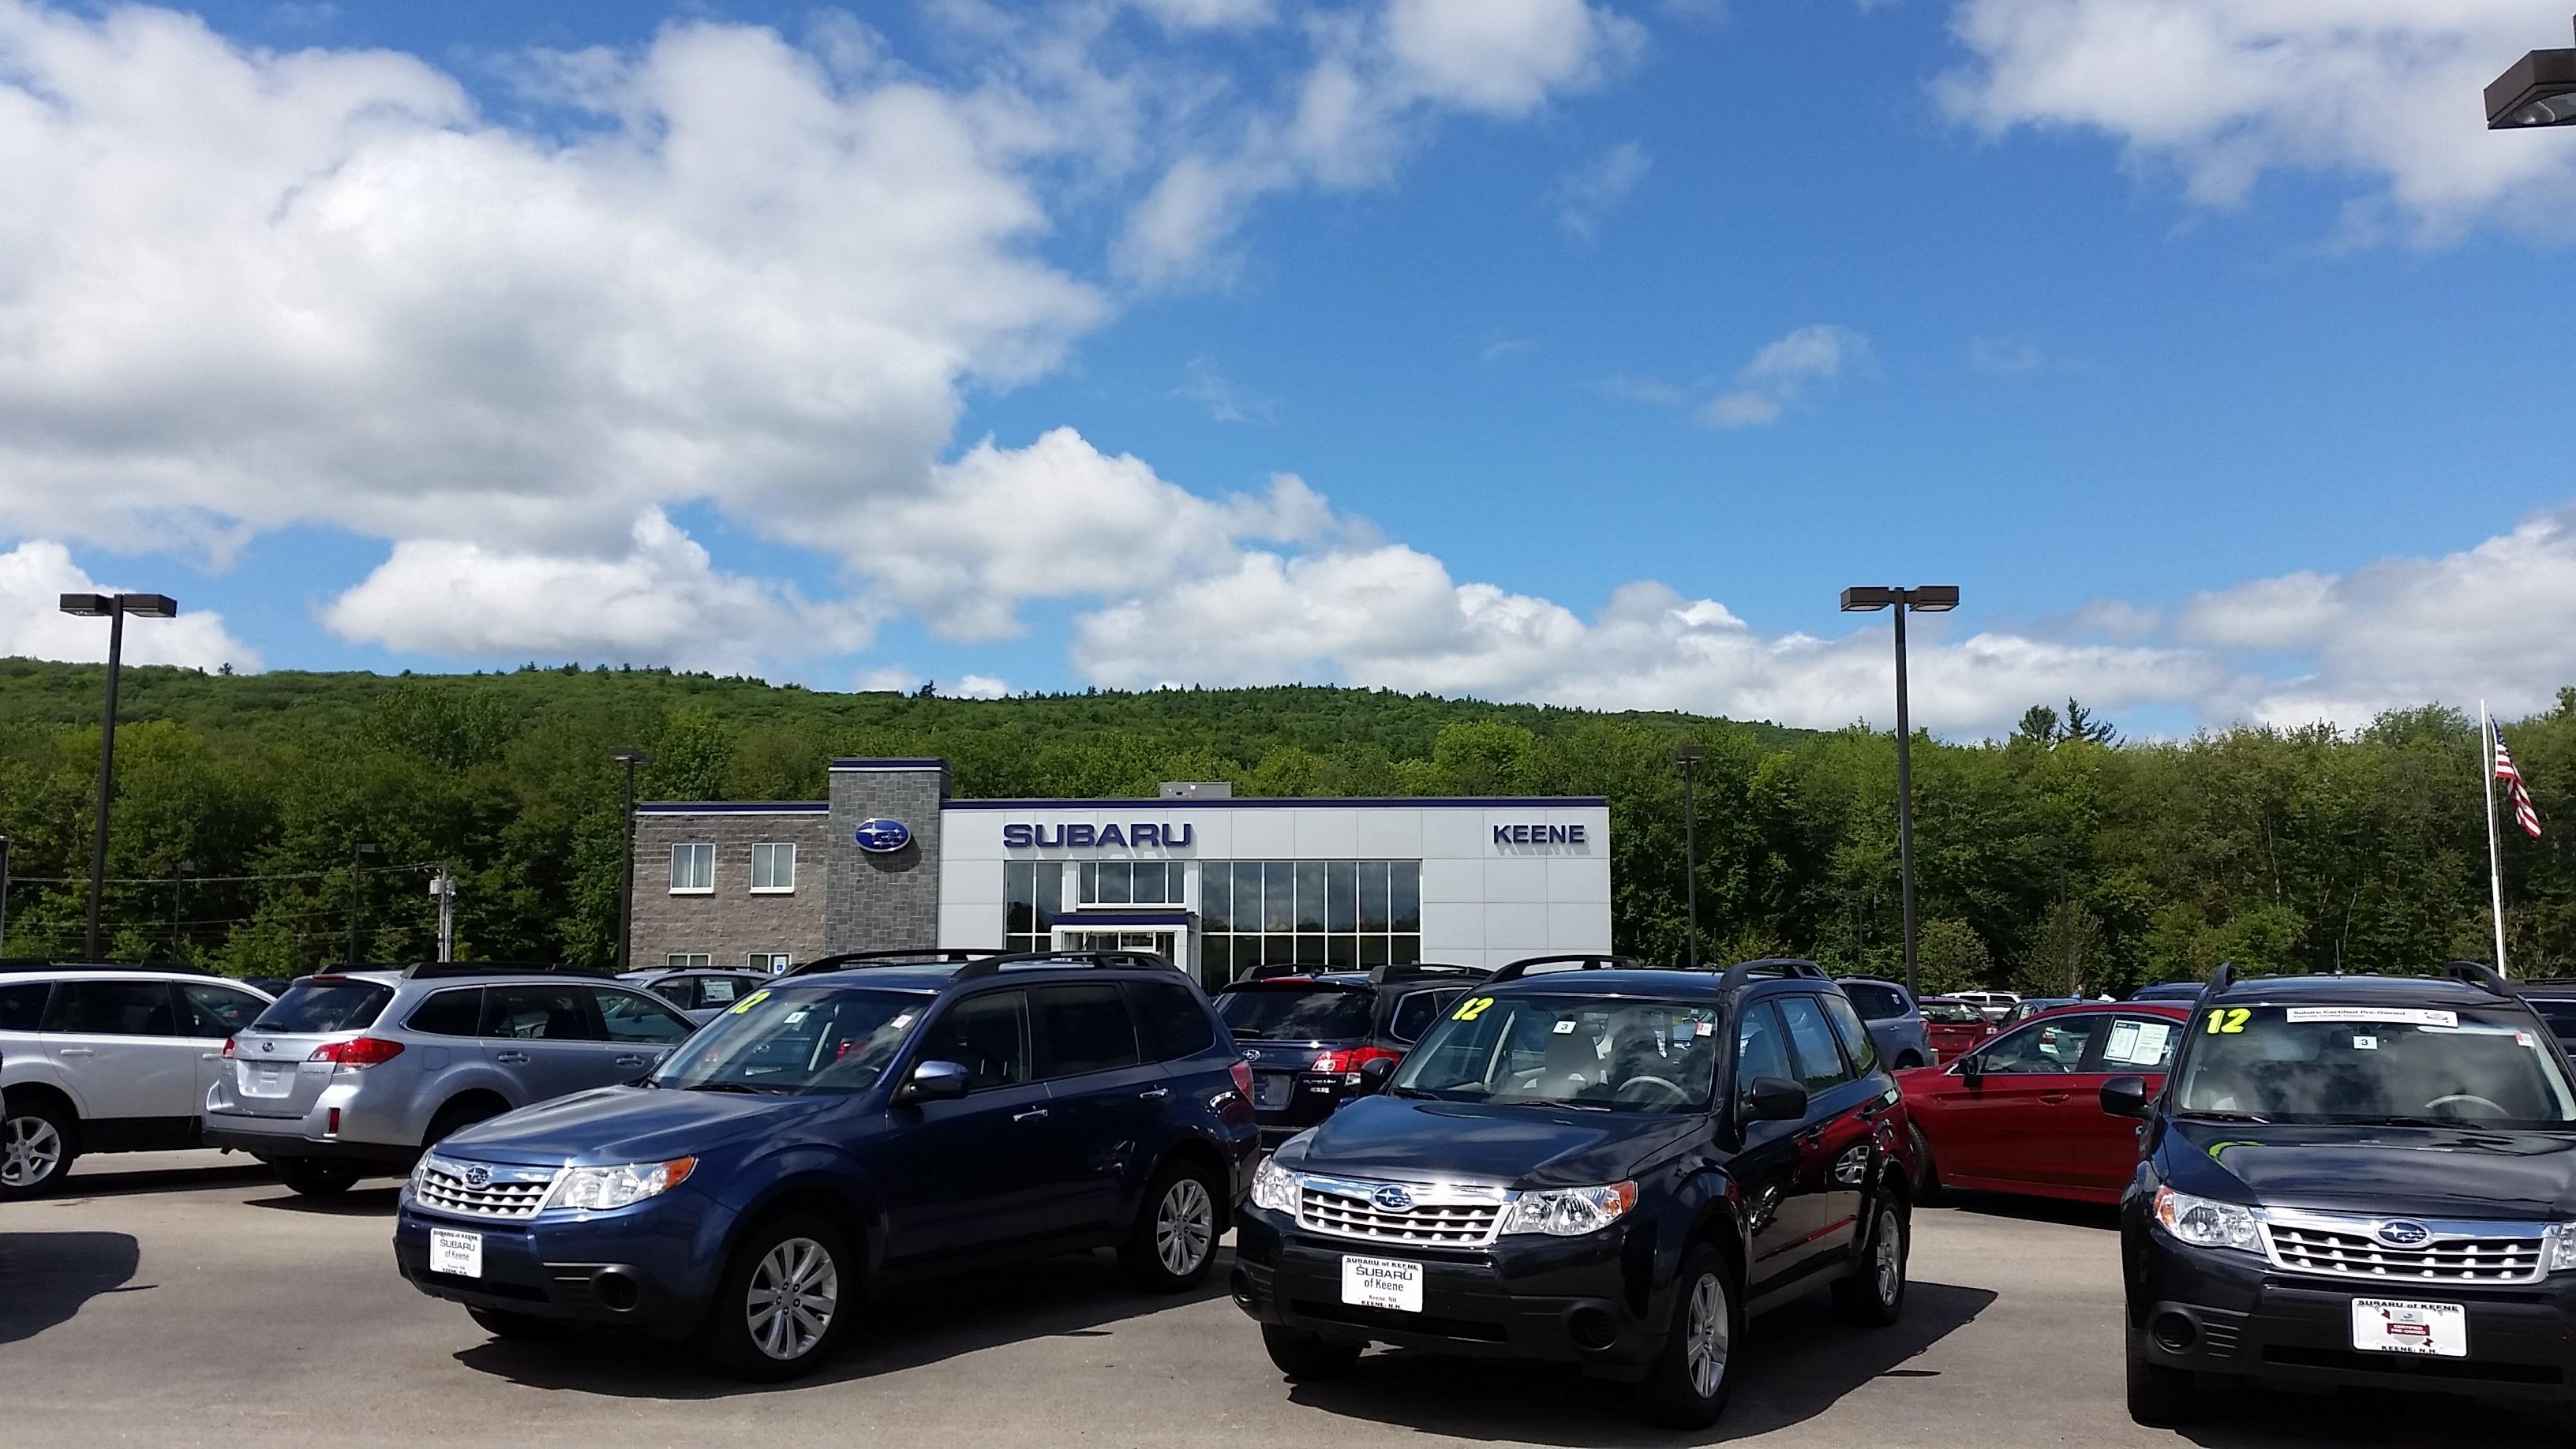 About Subaru Of Keene Serving Brattleboro Claremont Peterborough